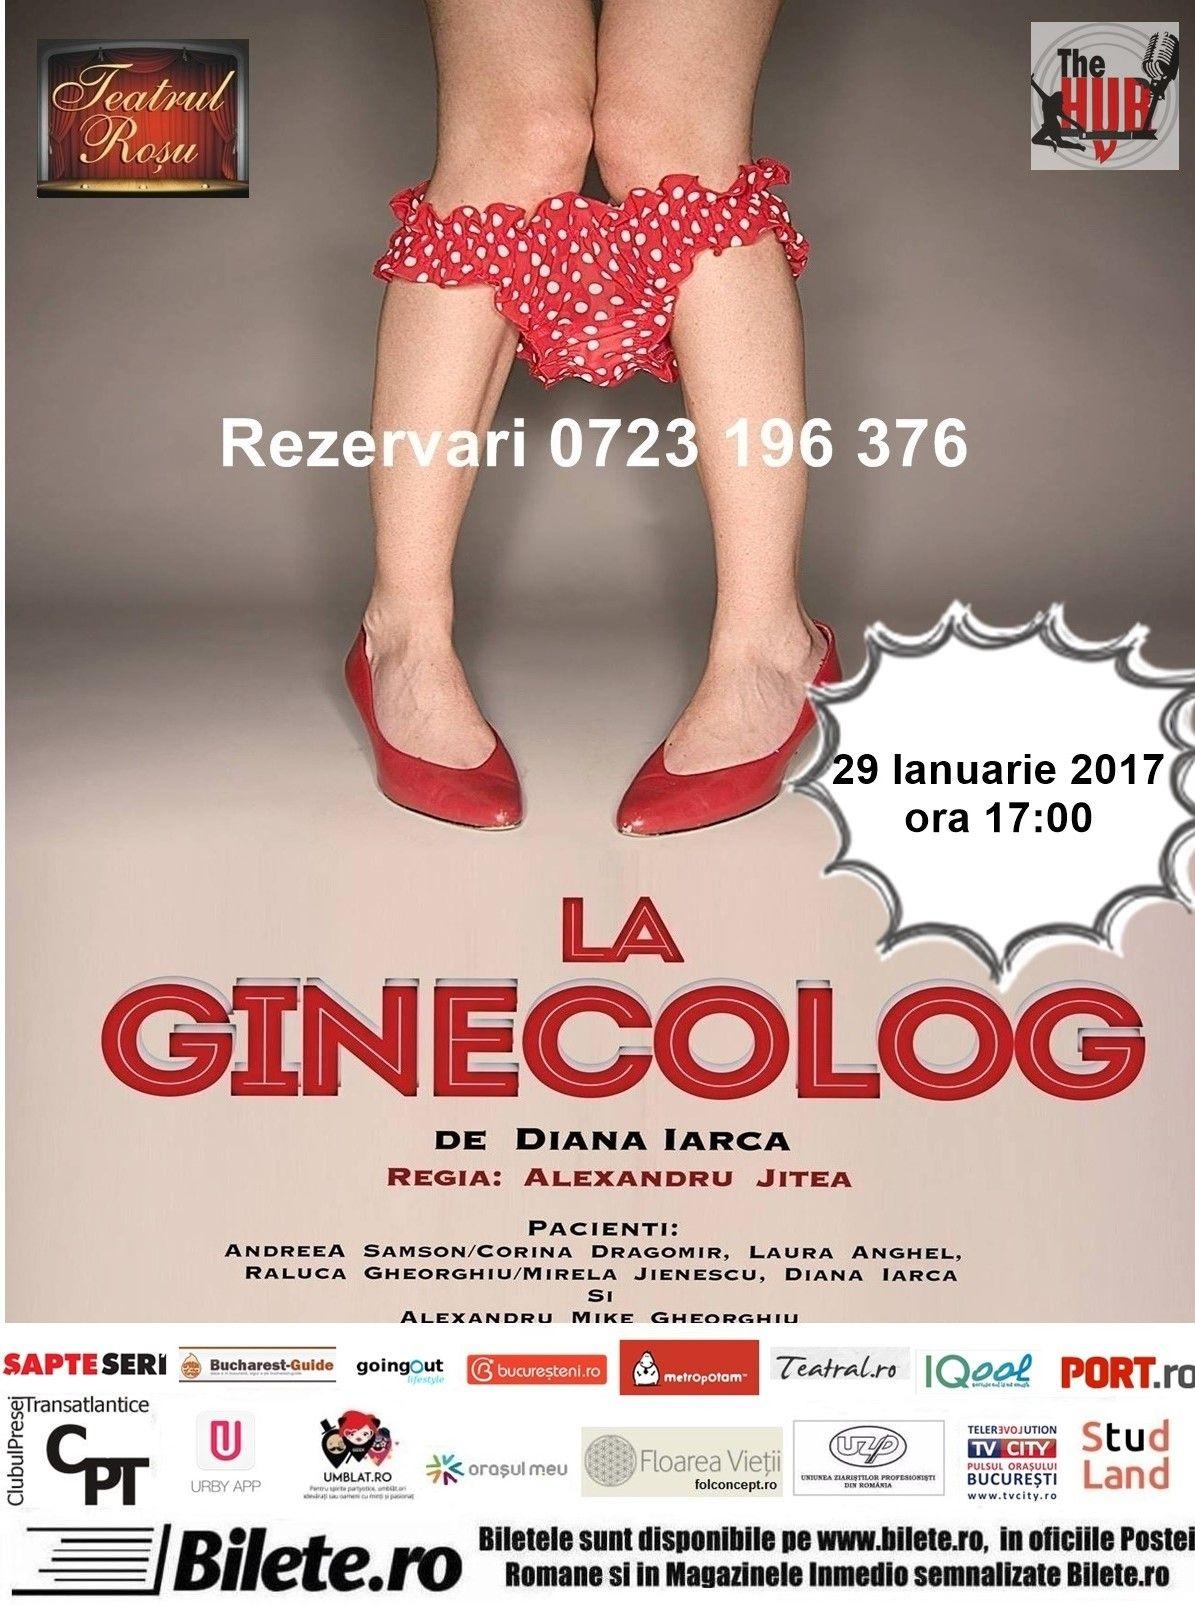 La ginecolog Diana, Bucharest, Regia